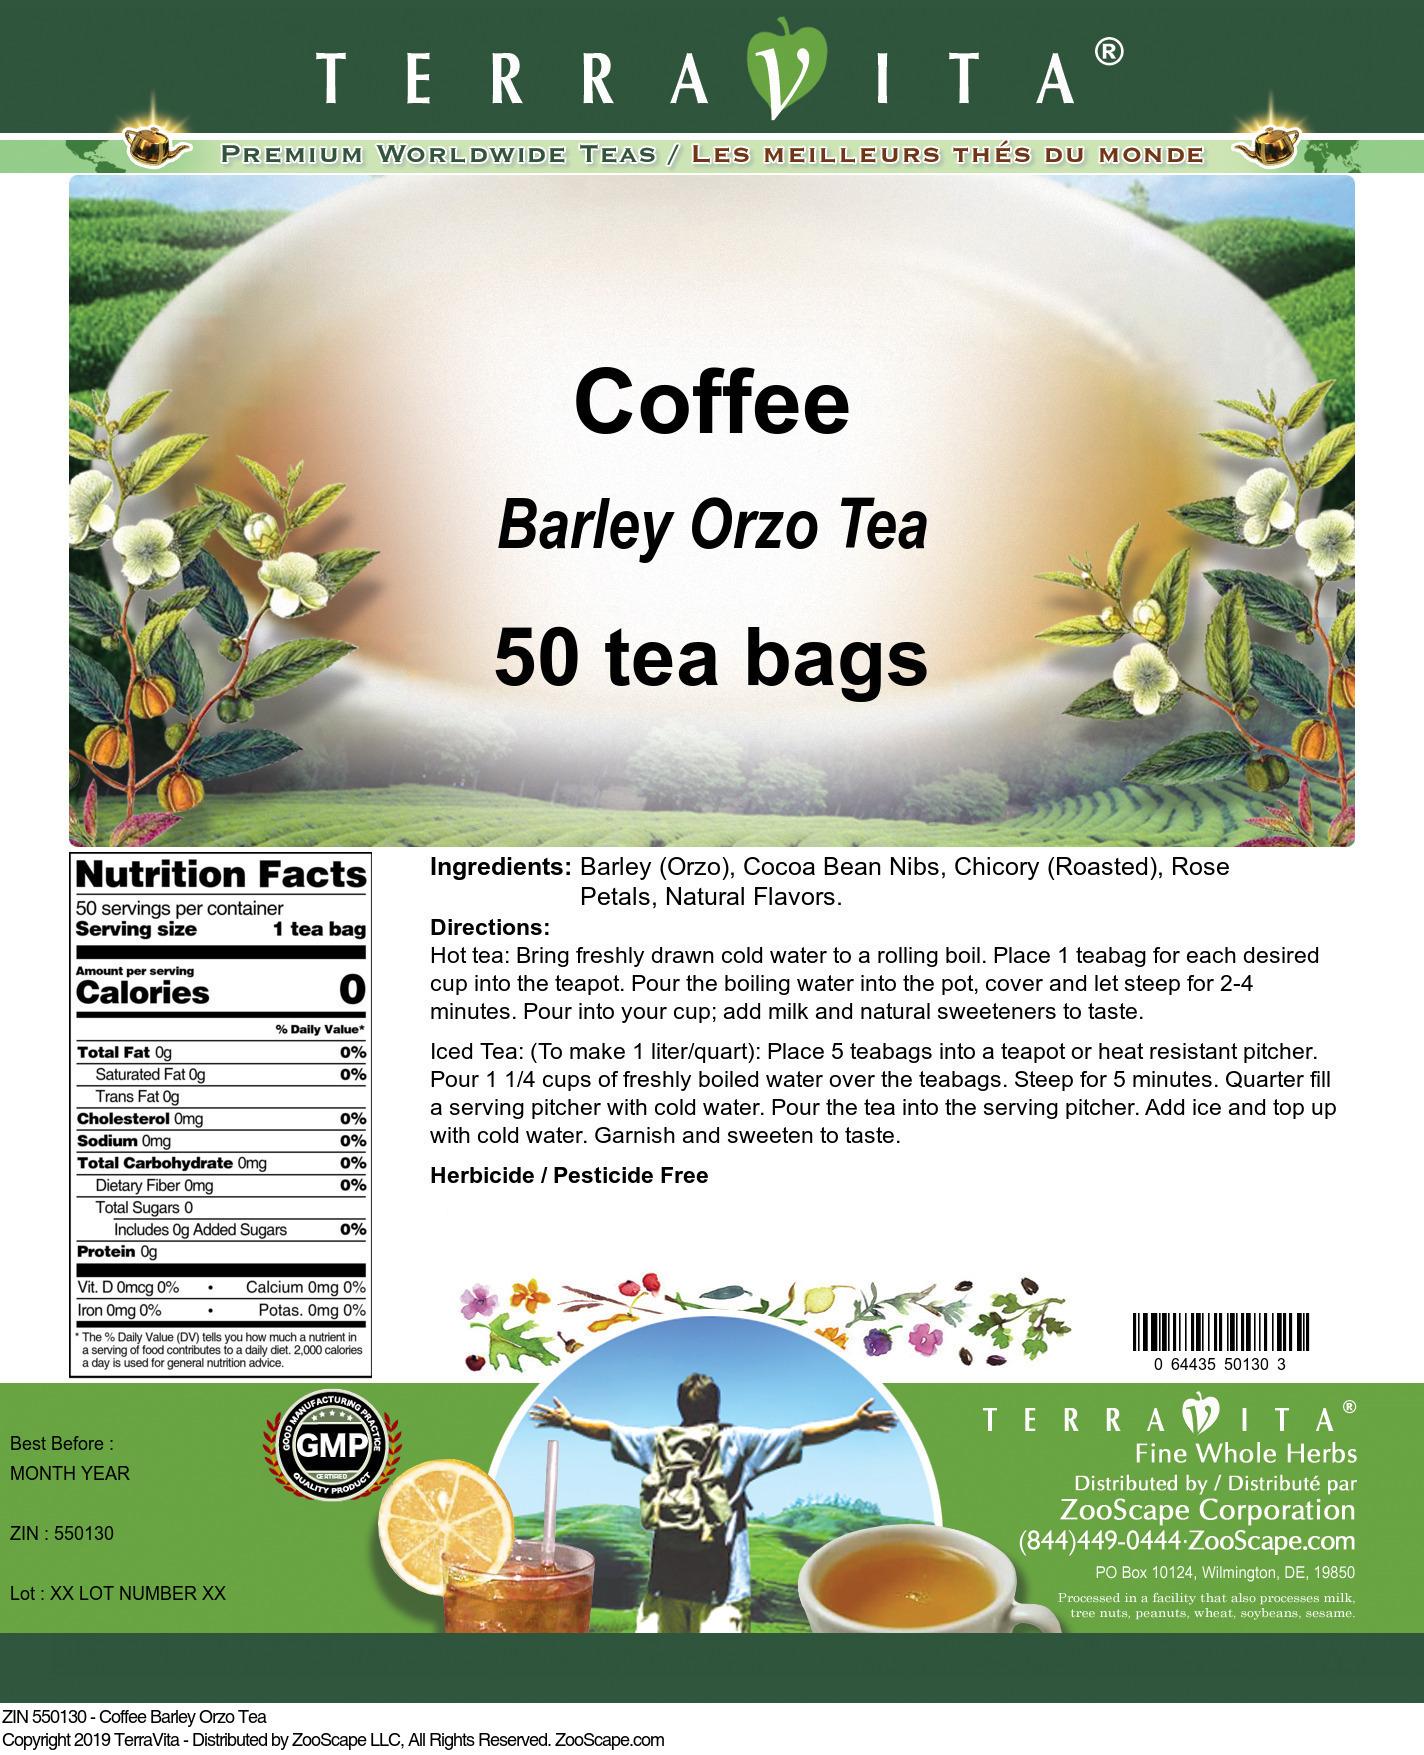 Coffee Barley Orzo Tea